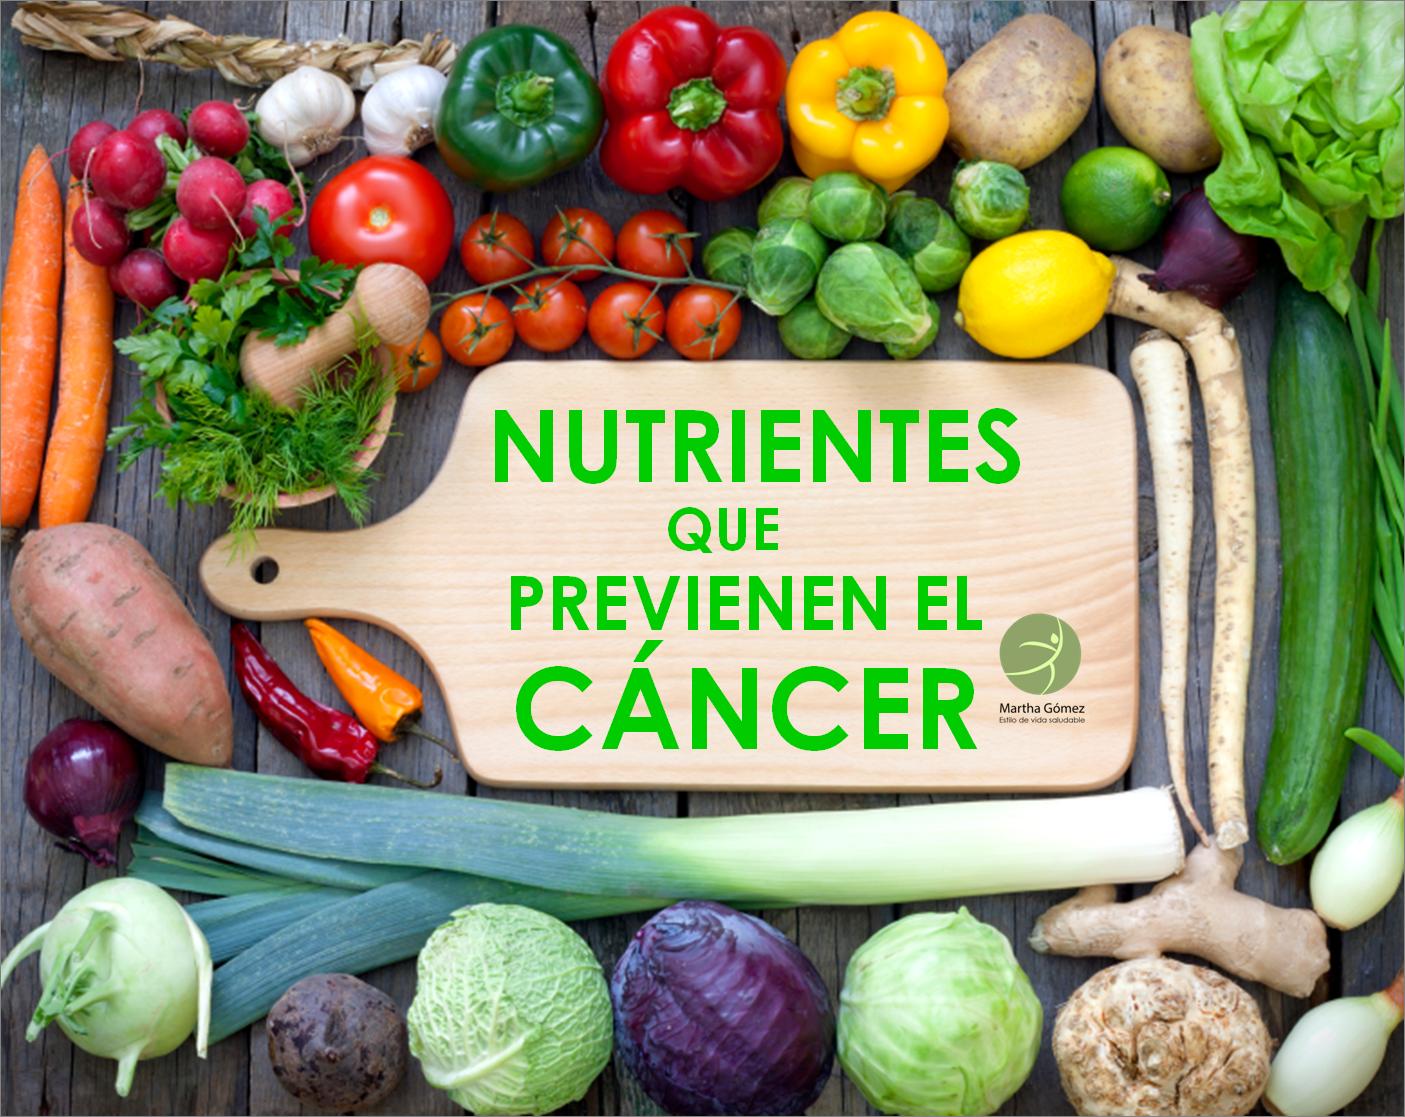 Alimentos nutri loga health coach martha g mez - Alimentos previenen cancer ...